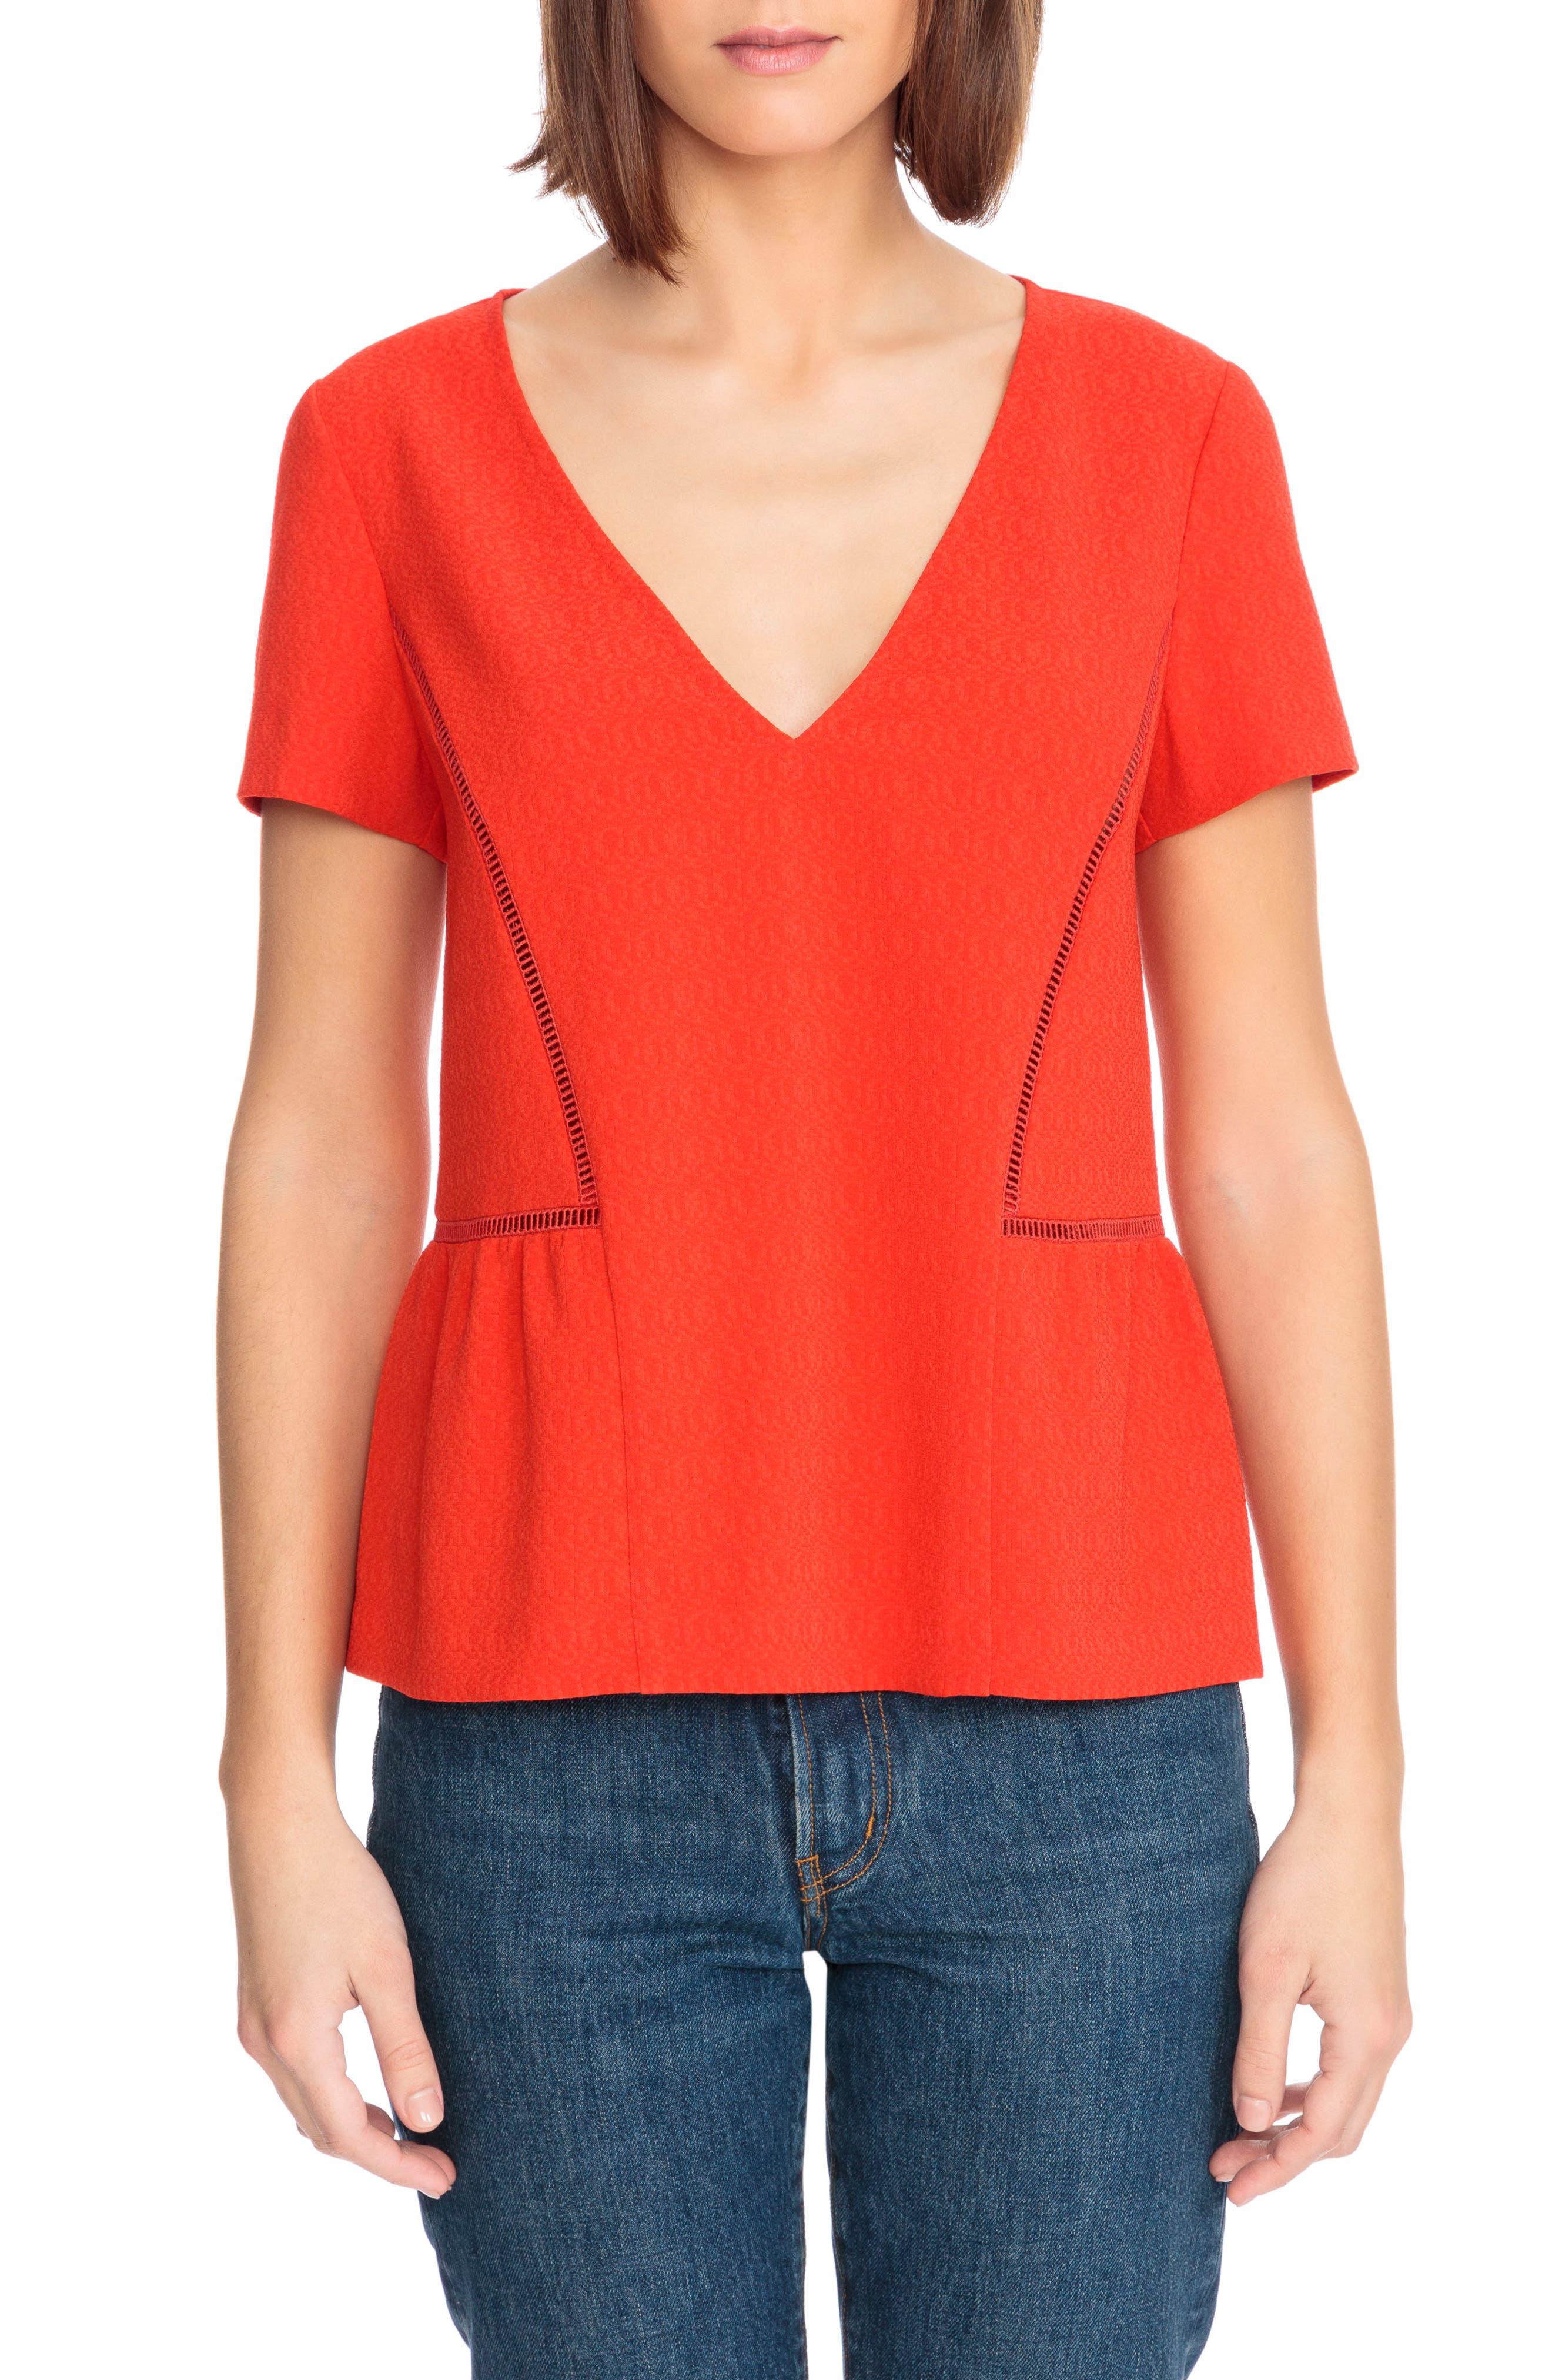 Amanda Ladder Stitch Blouse,                             Main thumbnail 1, color,                             Coral Red